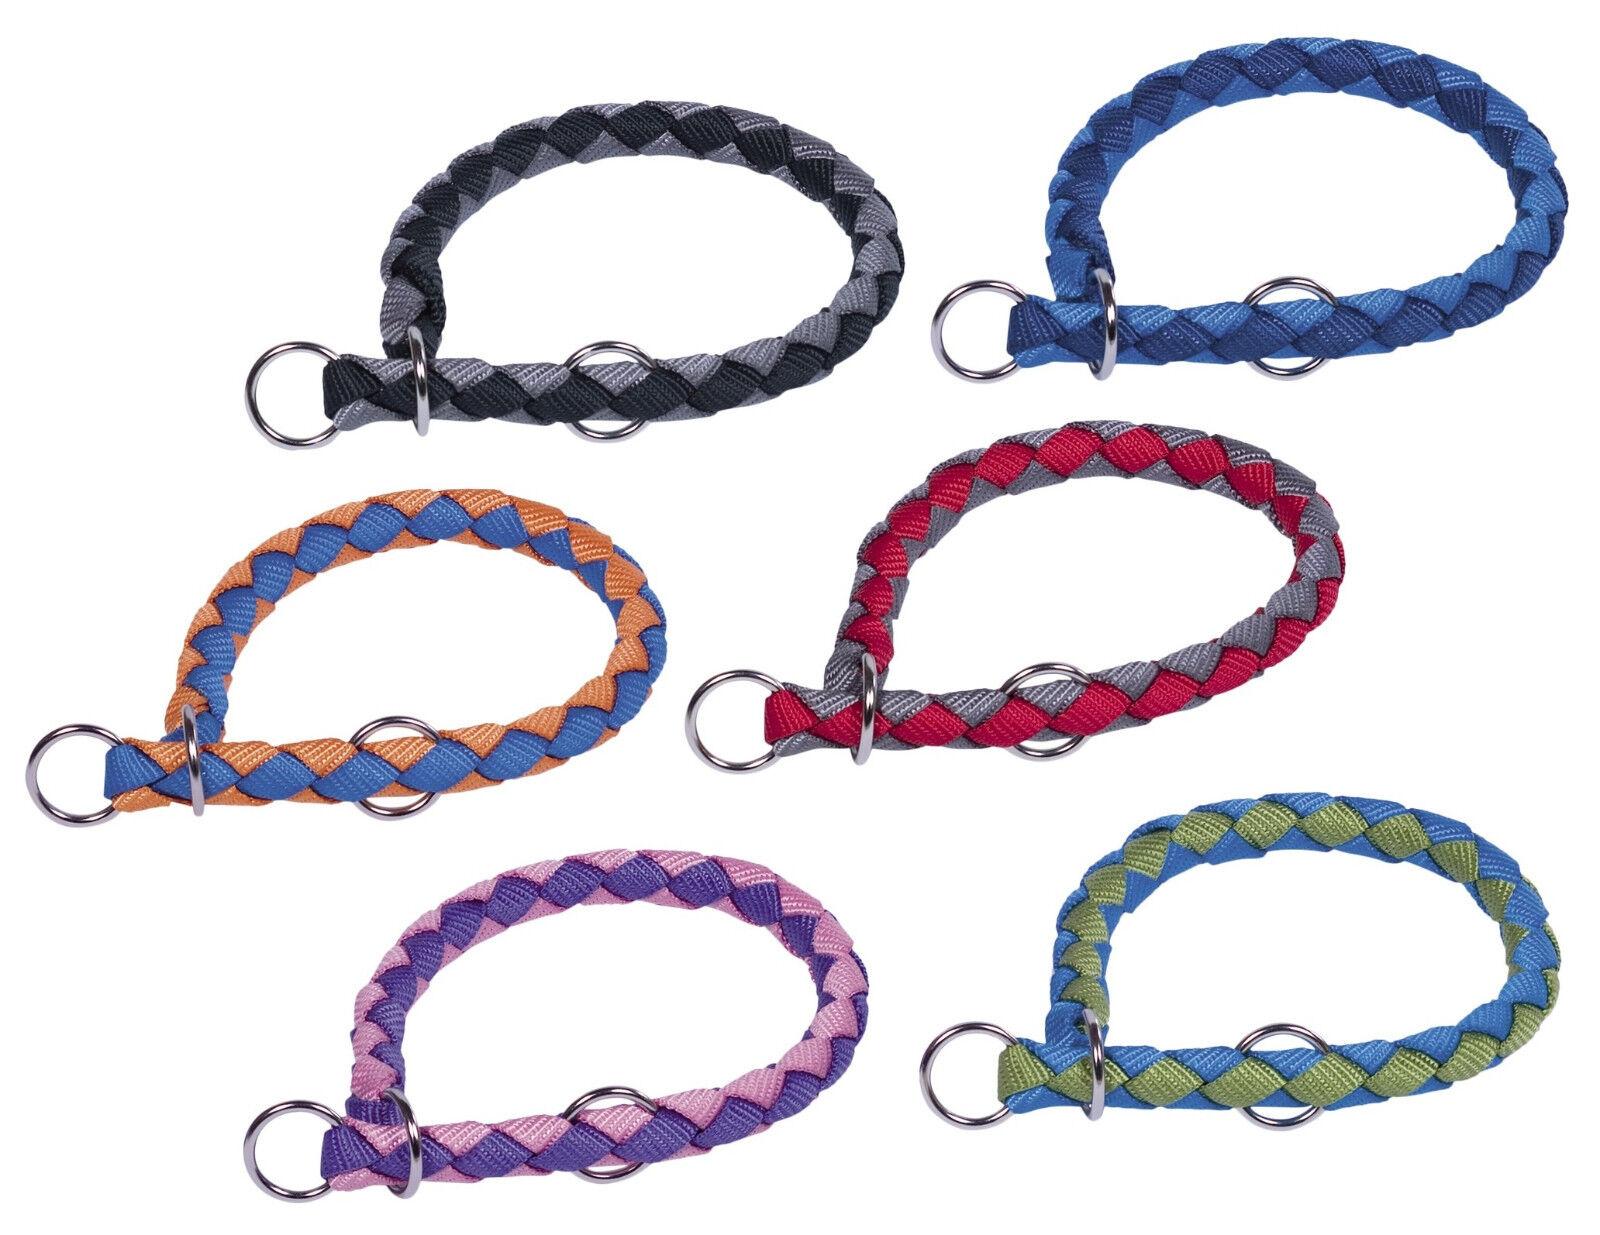 Würger geflochten 2 farbig 6 Größen Zugstopphalsband Hundehalsband Würgehalsband